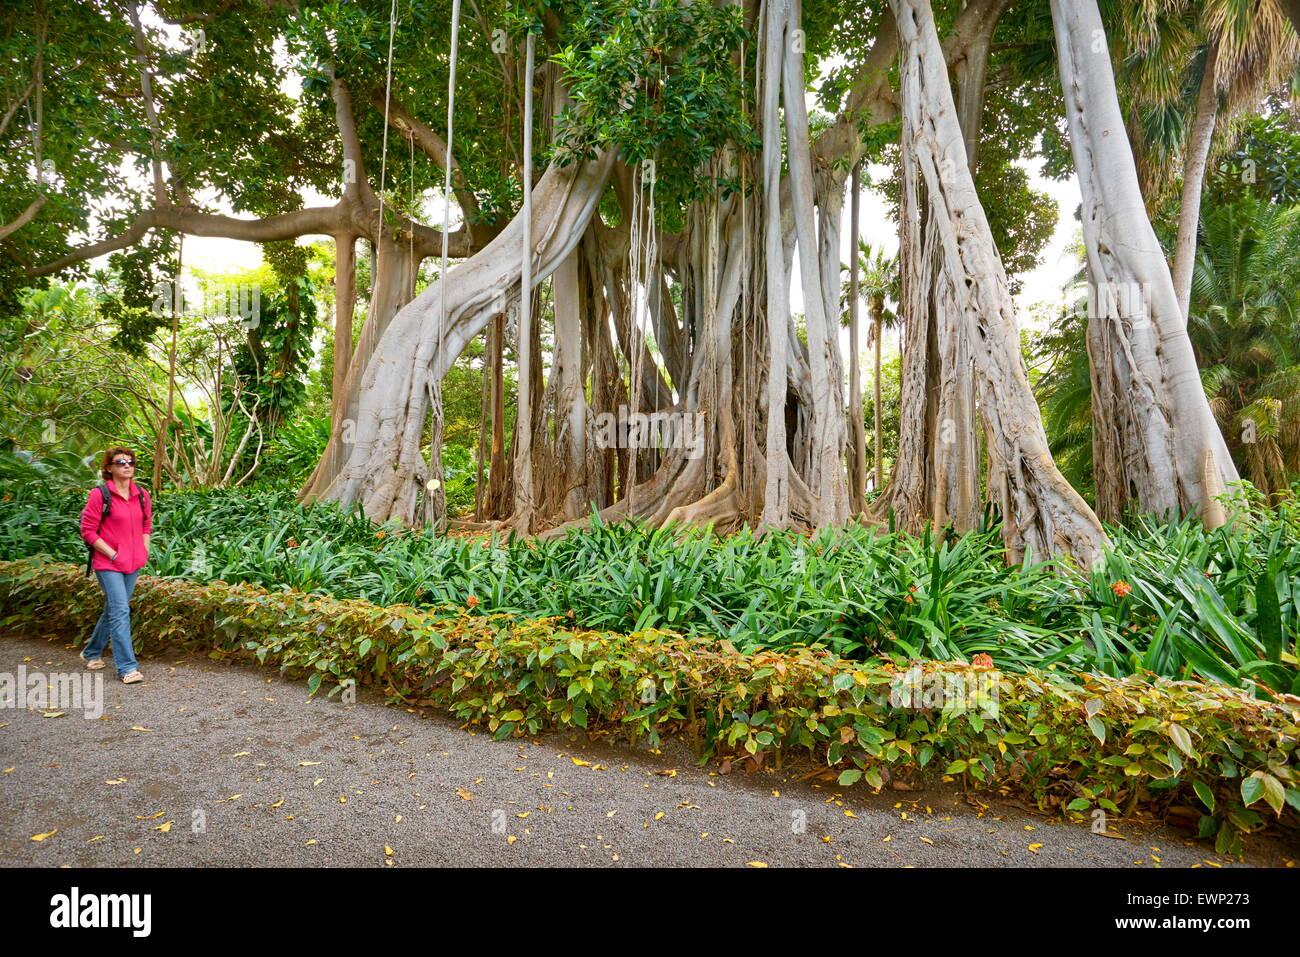 Ficus Arbre, jardin botanique, Puerto de la Cruz, Tenerife, Canaries, Espagne Banque D'Images